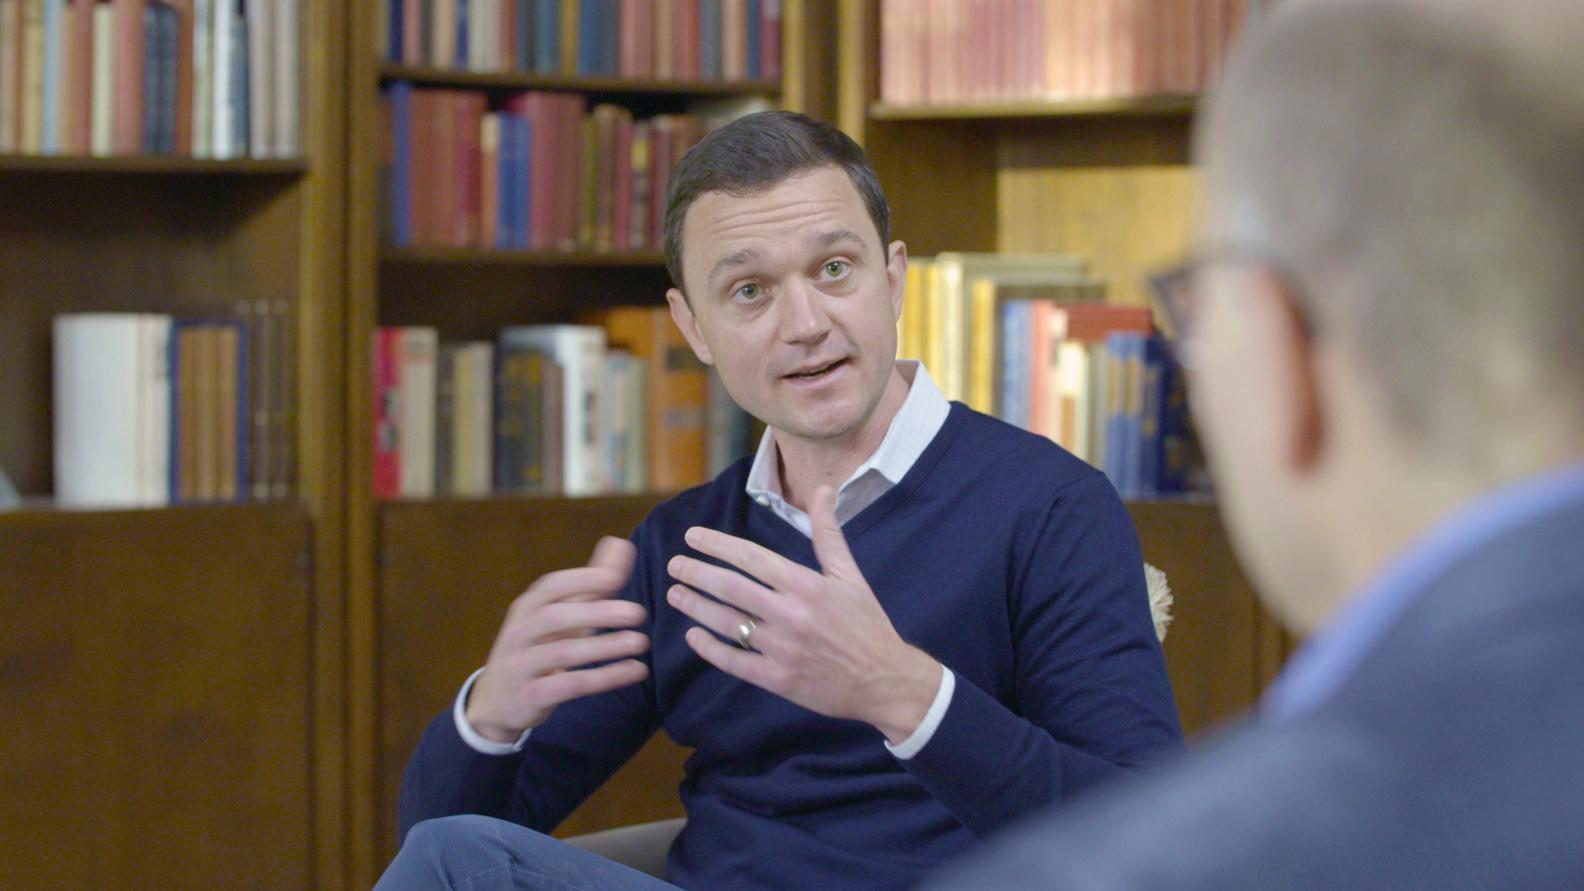 Brian Hooks, President of Charles Koch Foundation